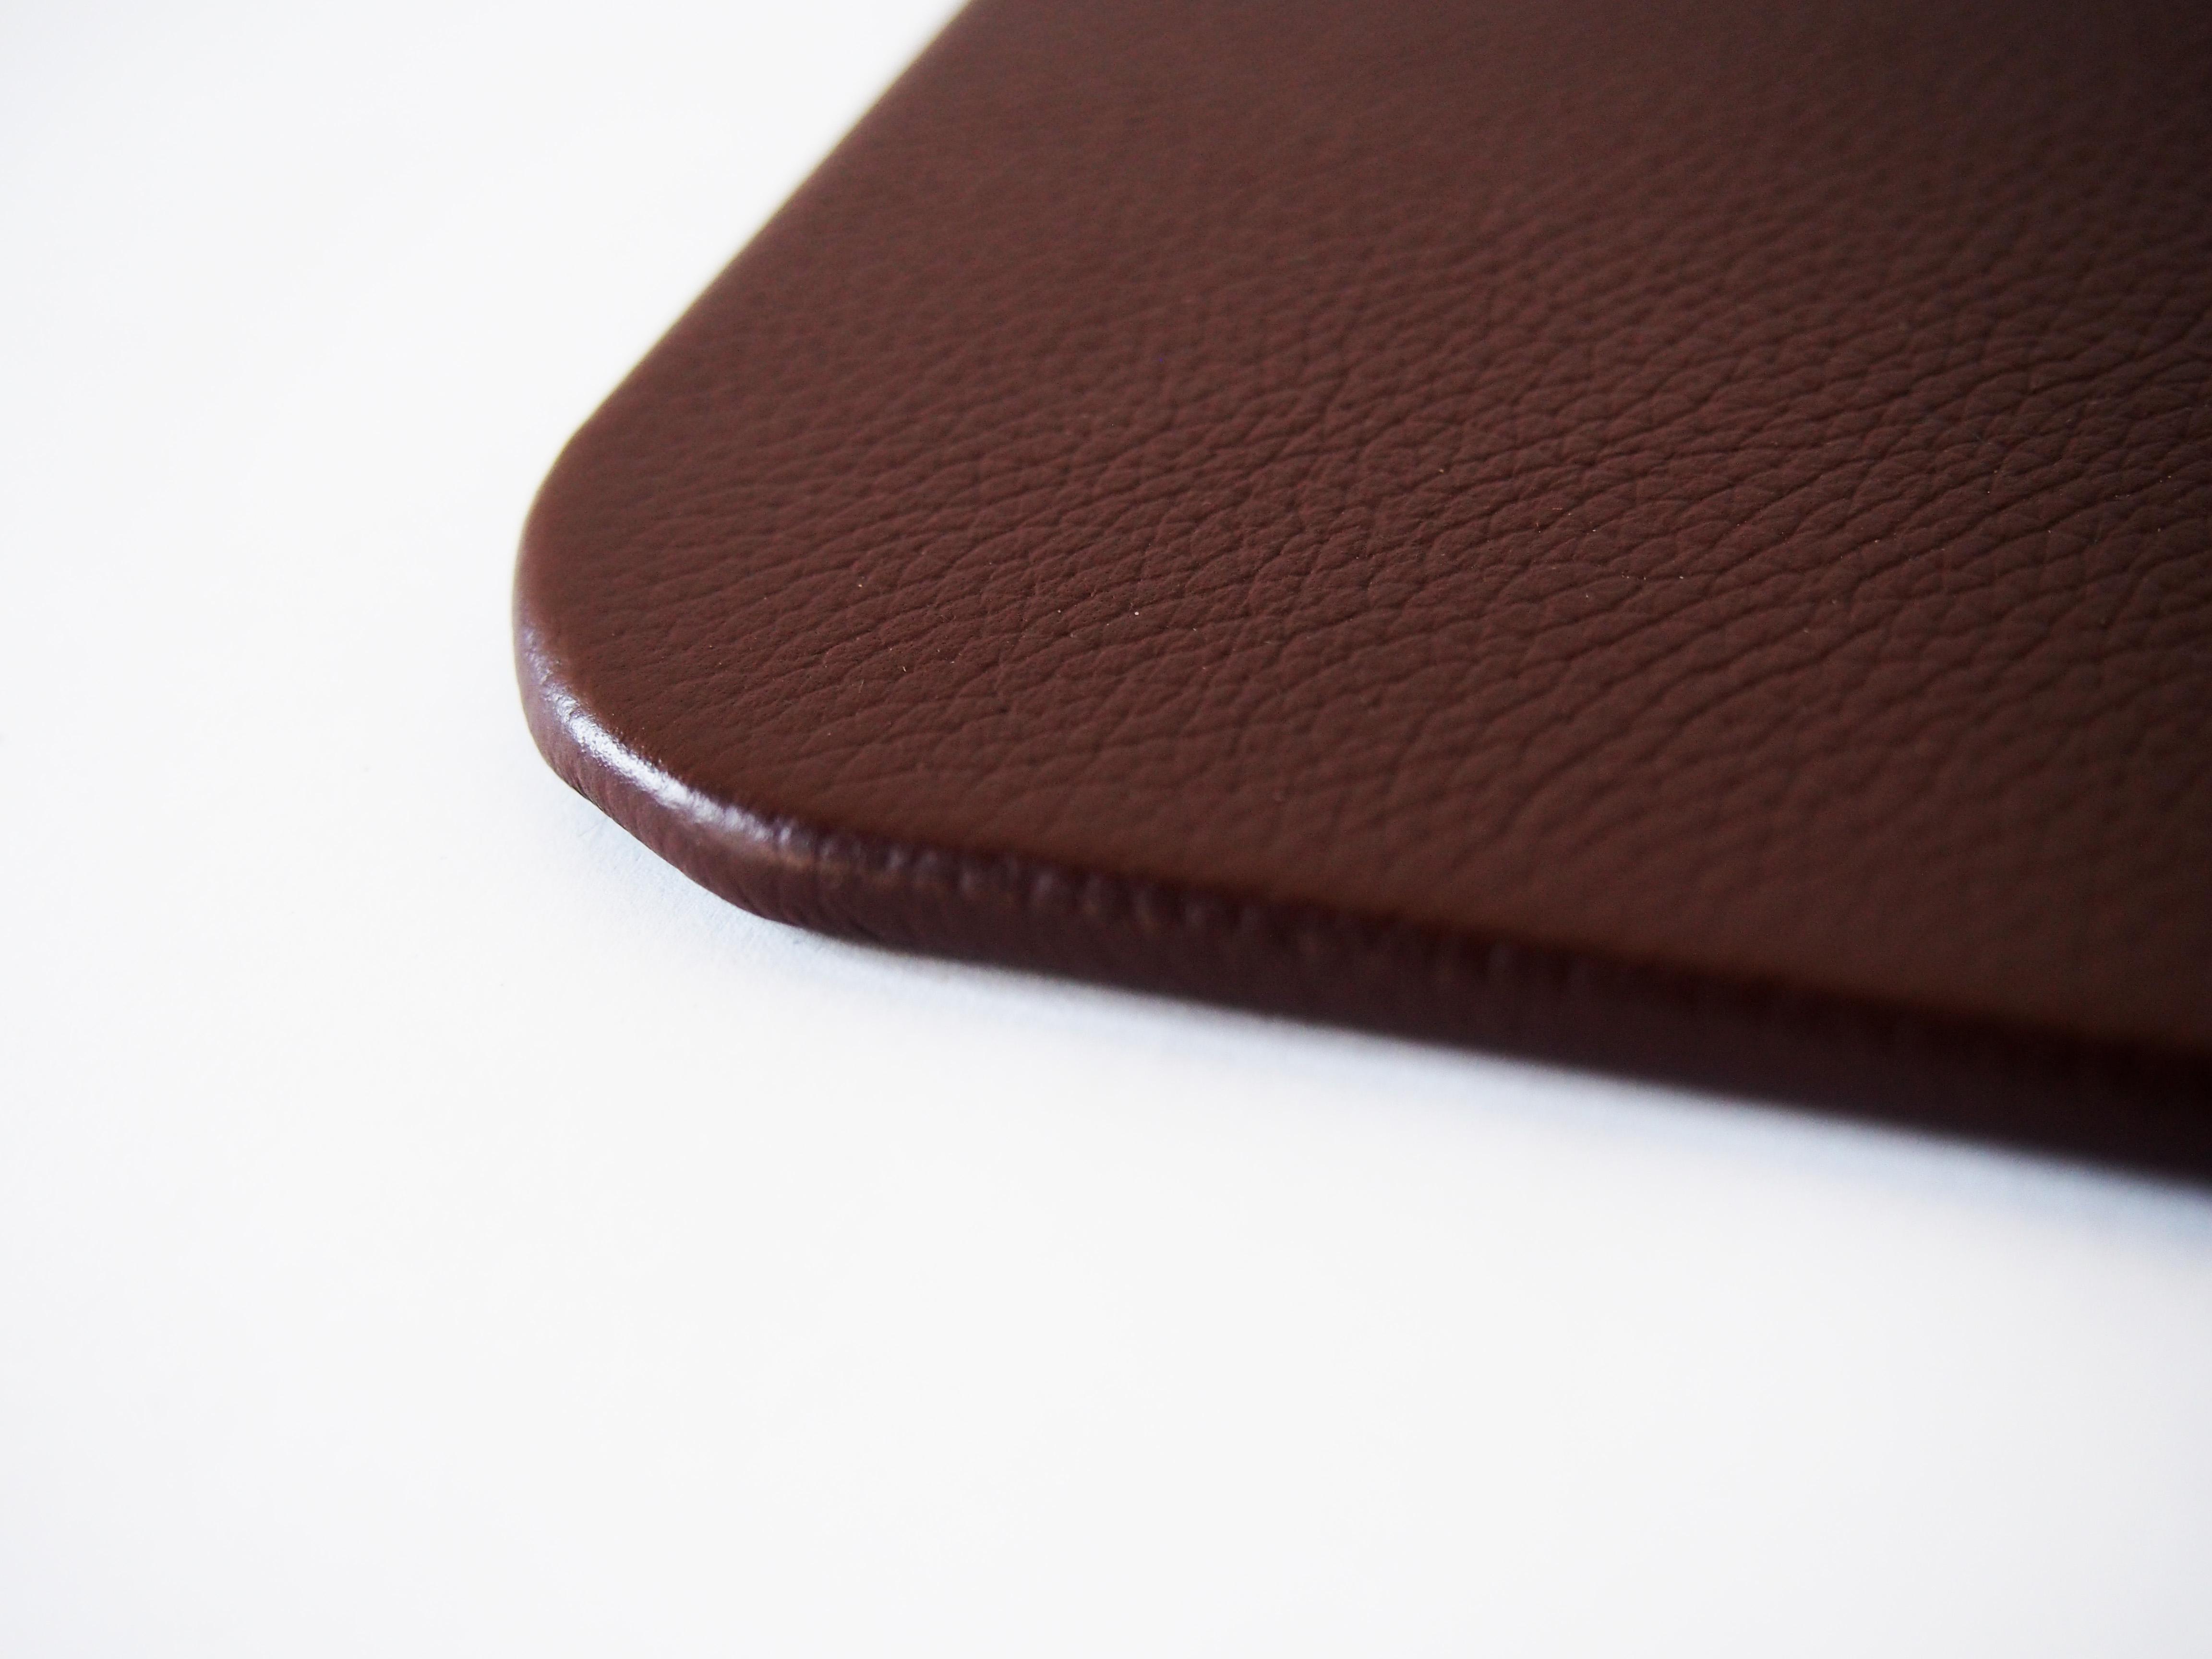 Brown Leather Desk Pad Genuine Top Grain Leather